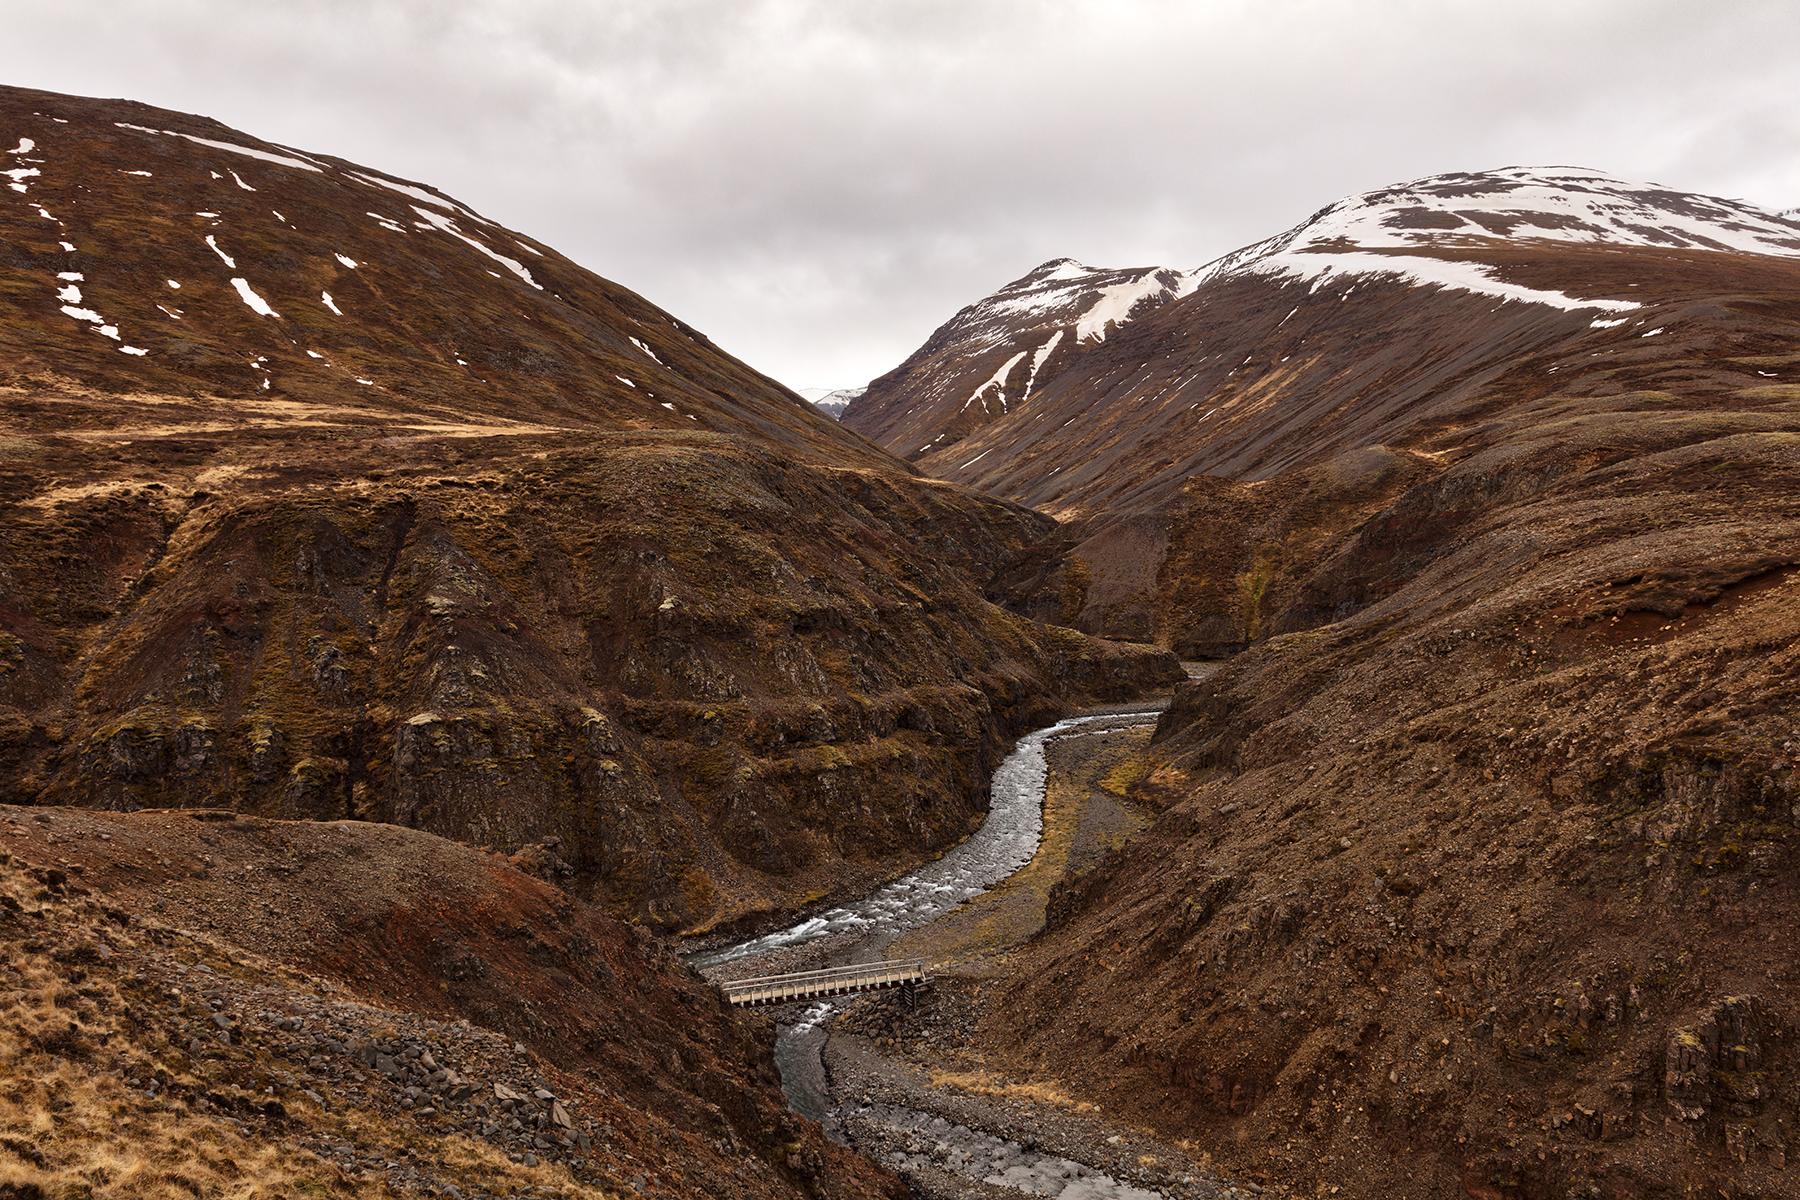 Iceland mountain river pass photo